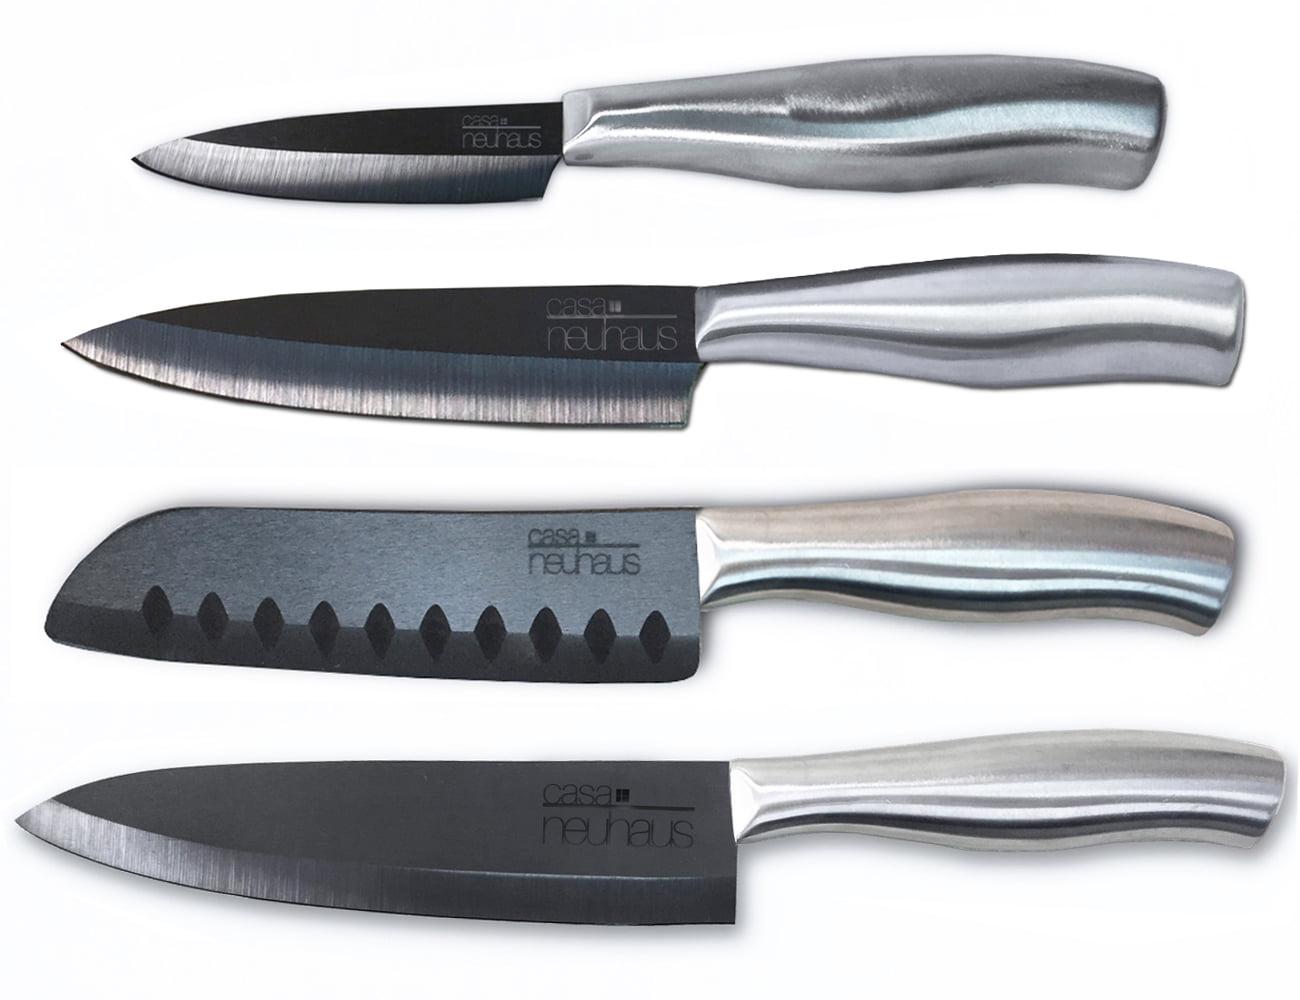 "Casa Neuhaus Deluxe Set 3"" Paring Knife, 5"" Utility Knife, 5"" Santoku Knife & 7"" Chef's... by Casa Neuhaus"